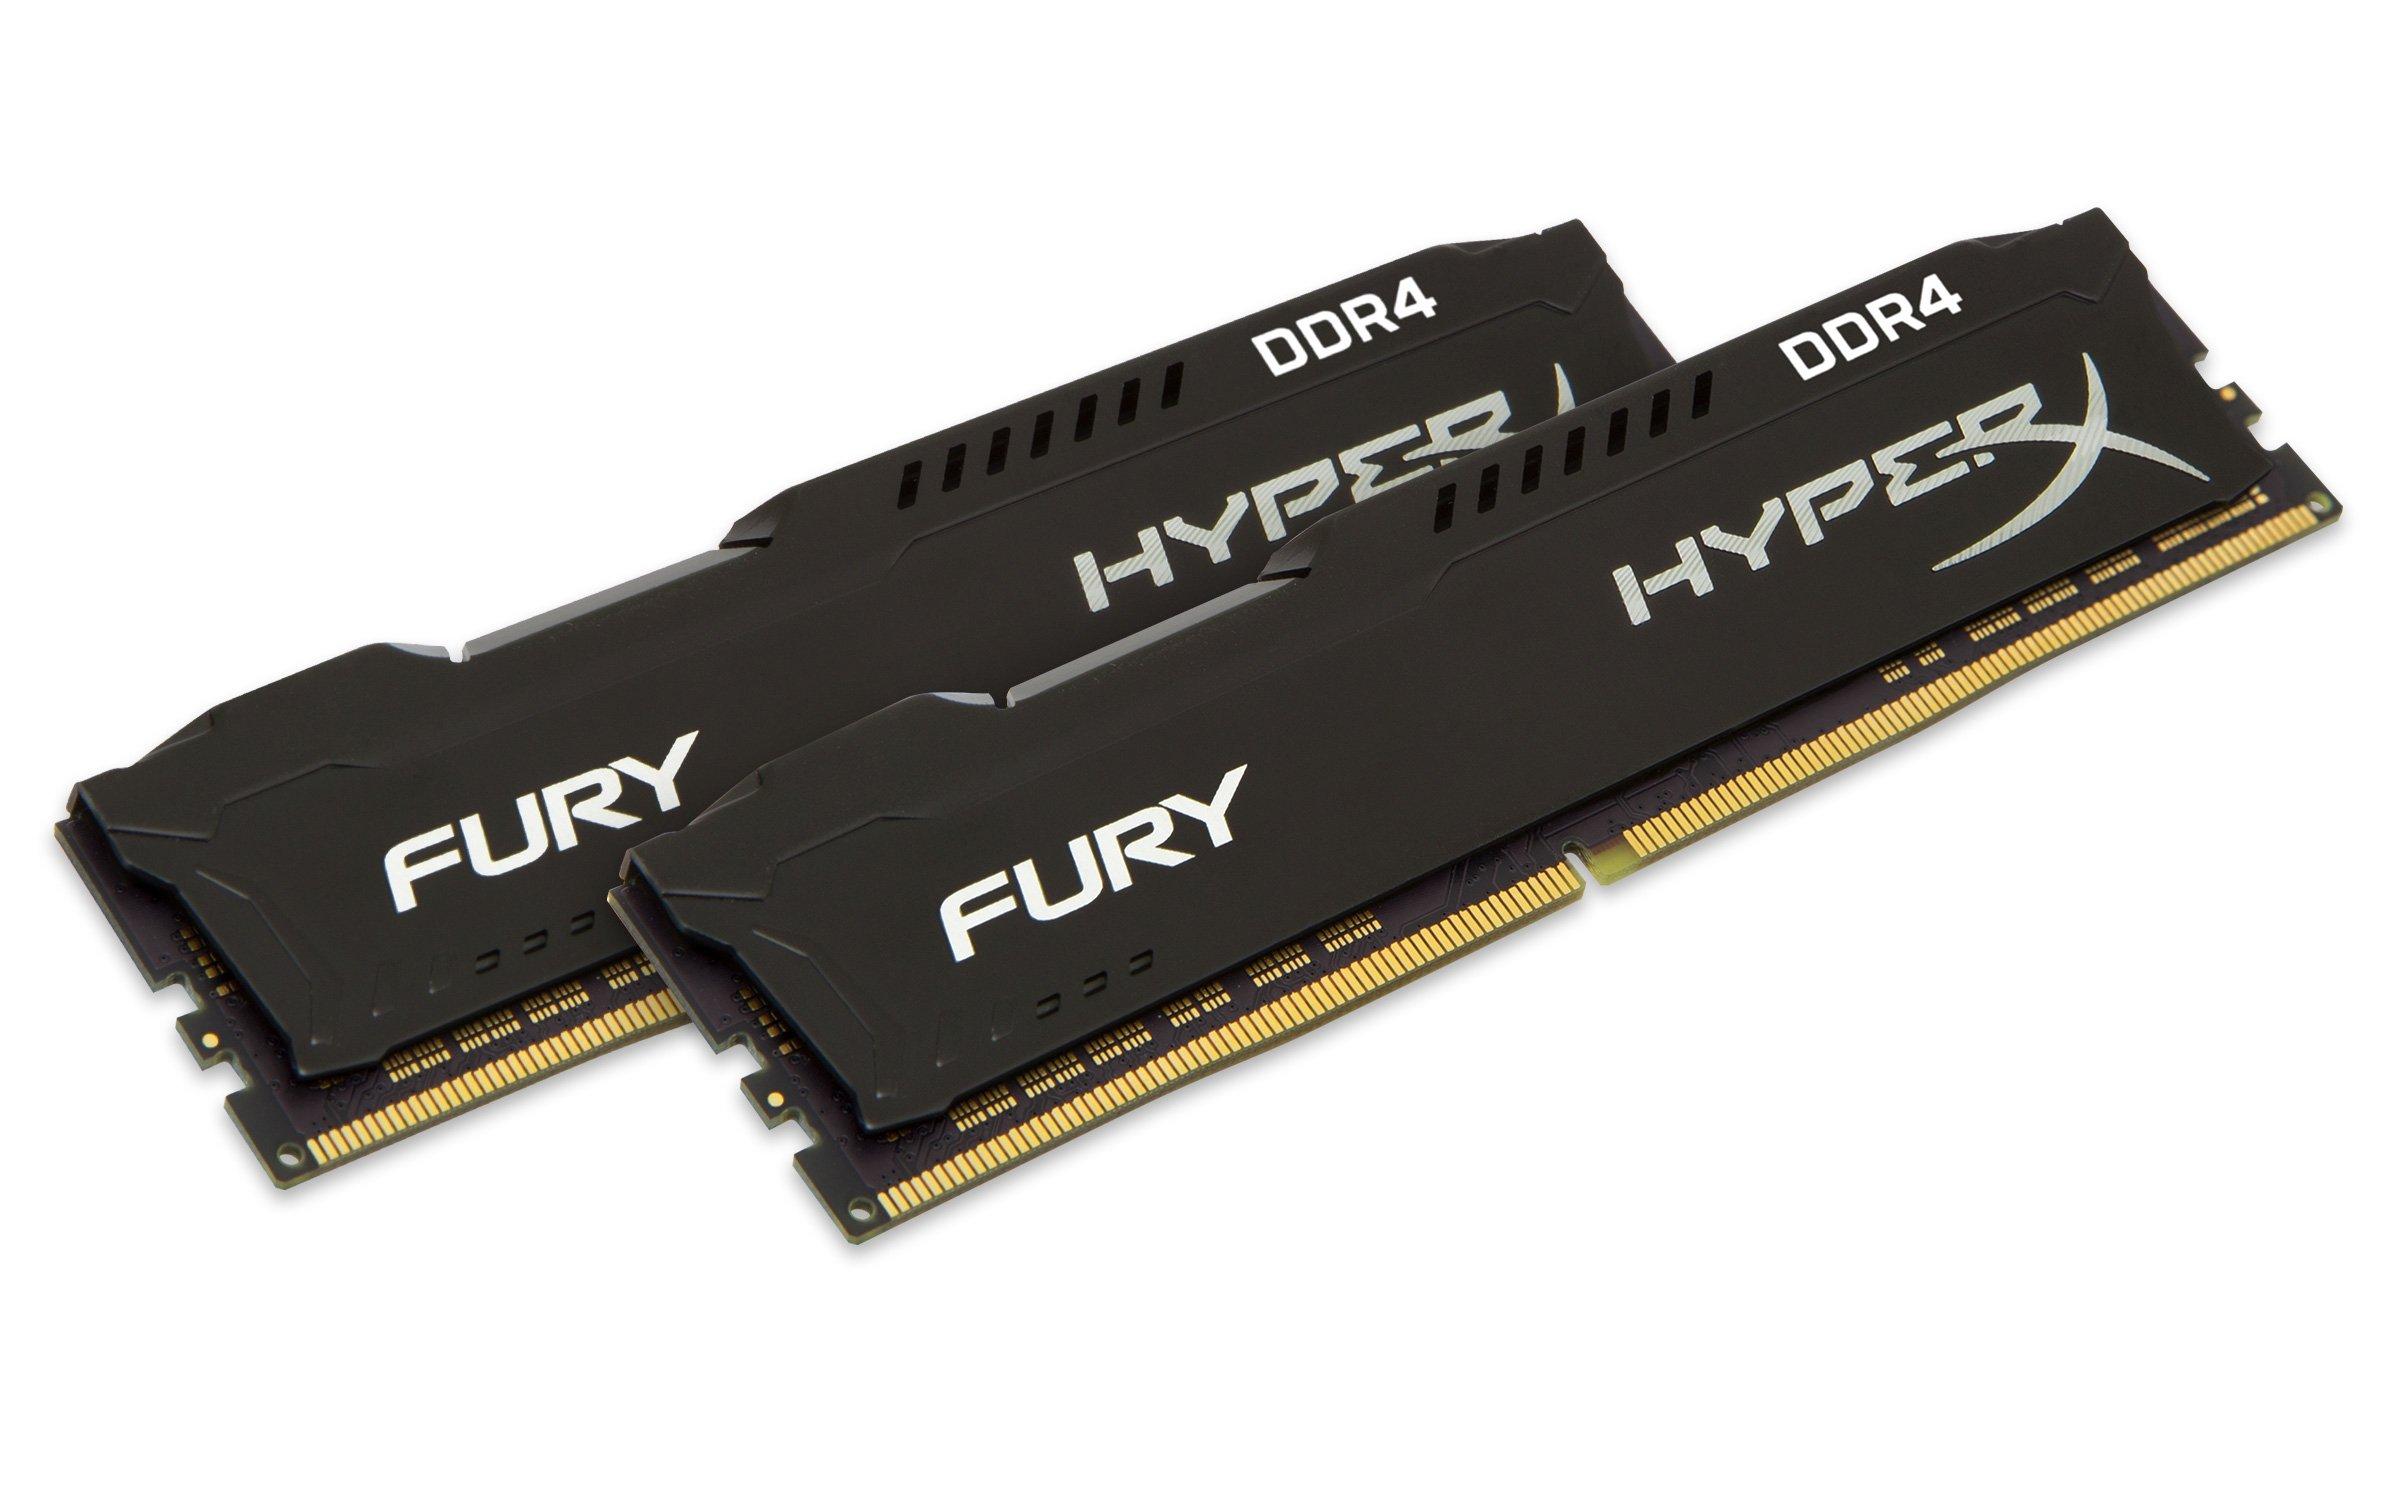 Kingston Technology HyperX Fury Black 32GB 3200MHz DDR4 CL18 DIMM(Kit of 2) Memory HX432C18FBK2/32